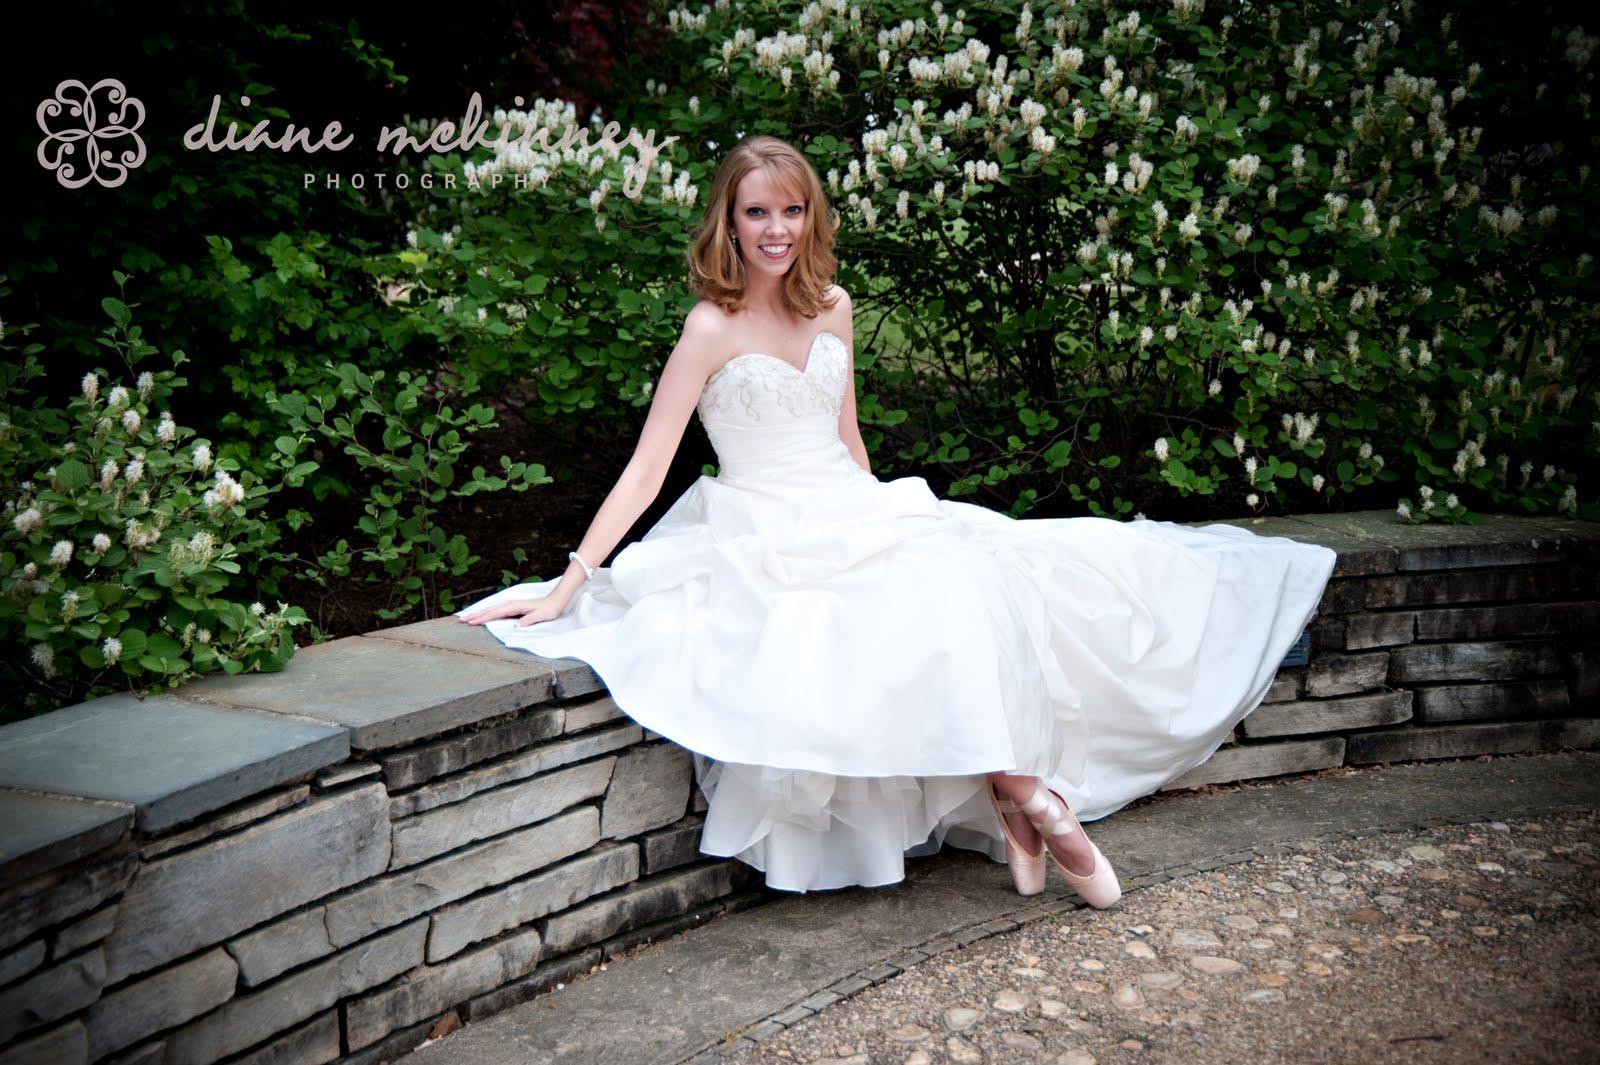 diane mckinney photo gorgeous ballerina bride in duke gardens raleigh wedding photographer. Black Bedroom Furniture Sets. Home Design Ideas